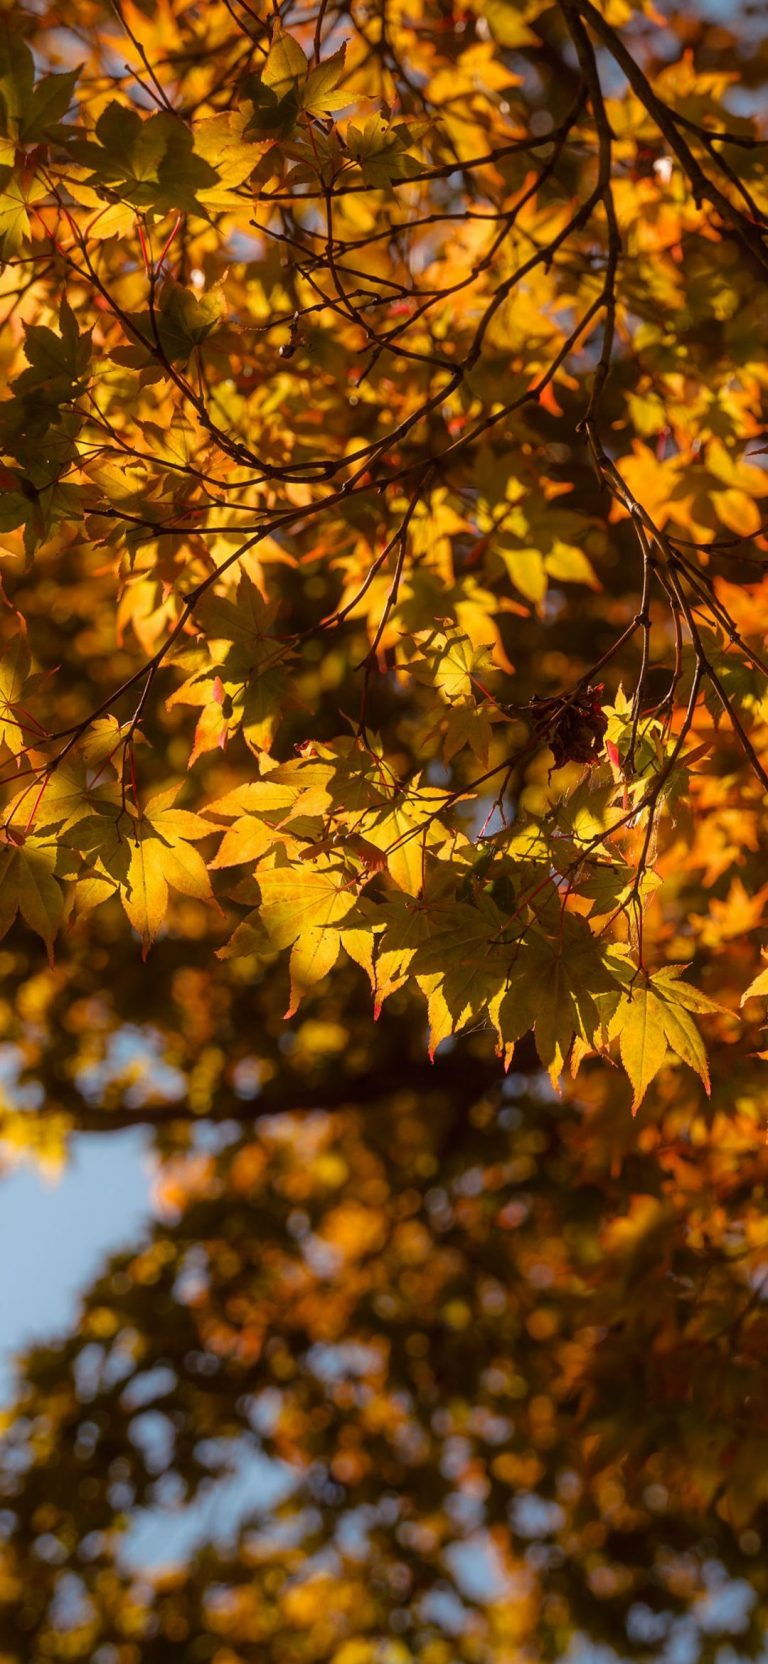 Autumn Phone Wallpaper 031 768x1664